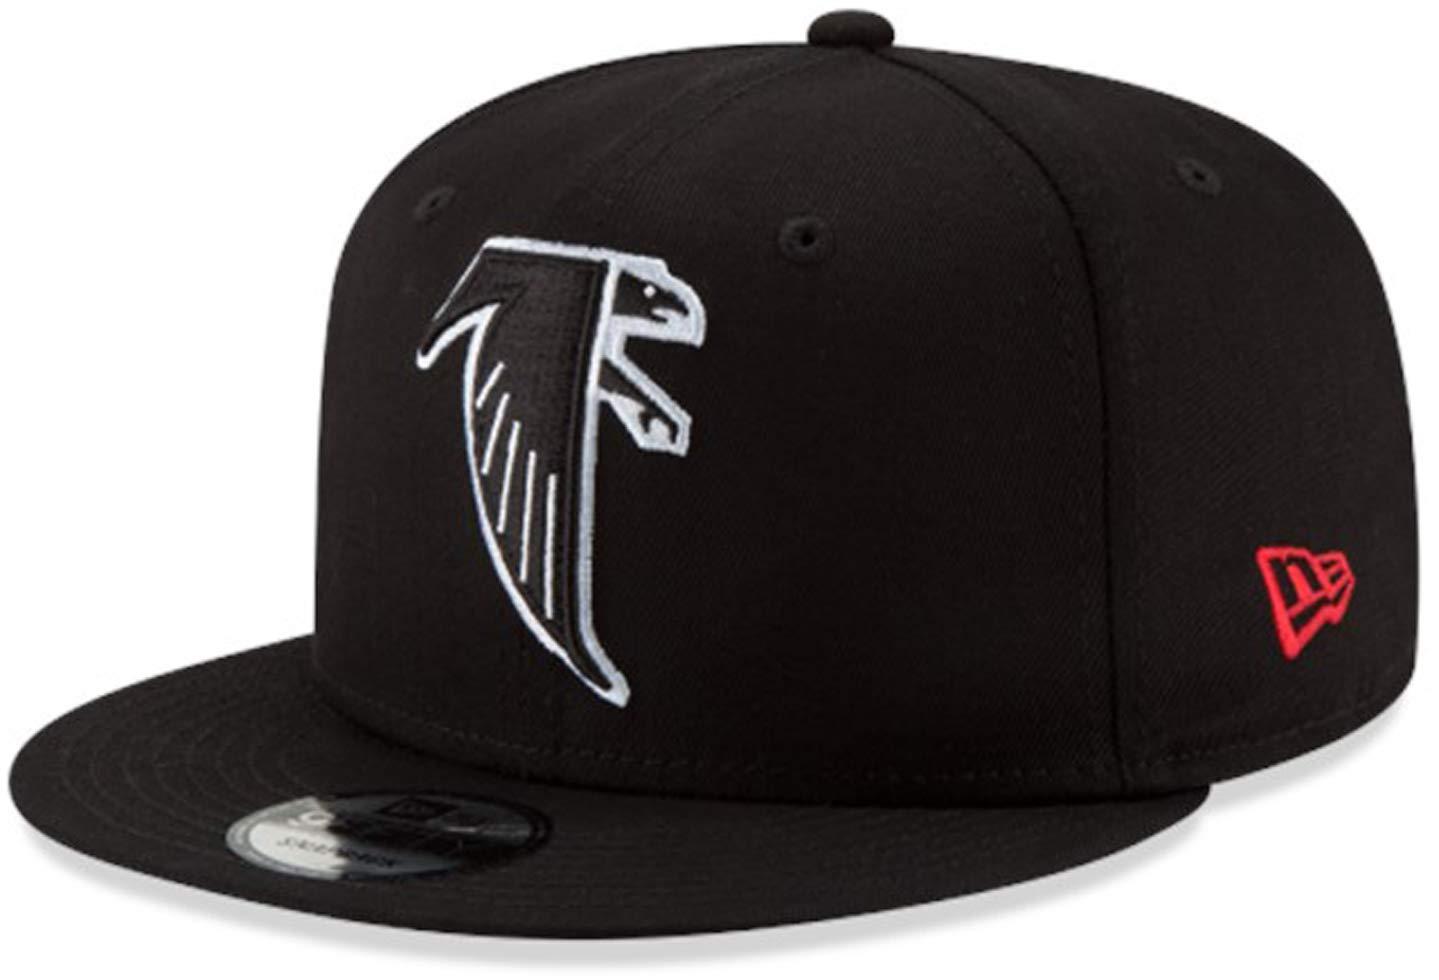 10add2bc New Era Atlanta Falcons Hat NFL Black Team Color Historic Logo 9FIFTY  Snapback Adjustable Cap Adult One Size : OSFM